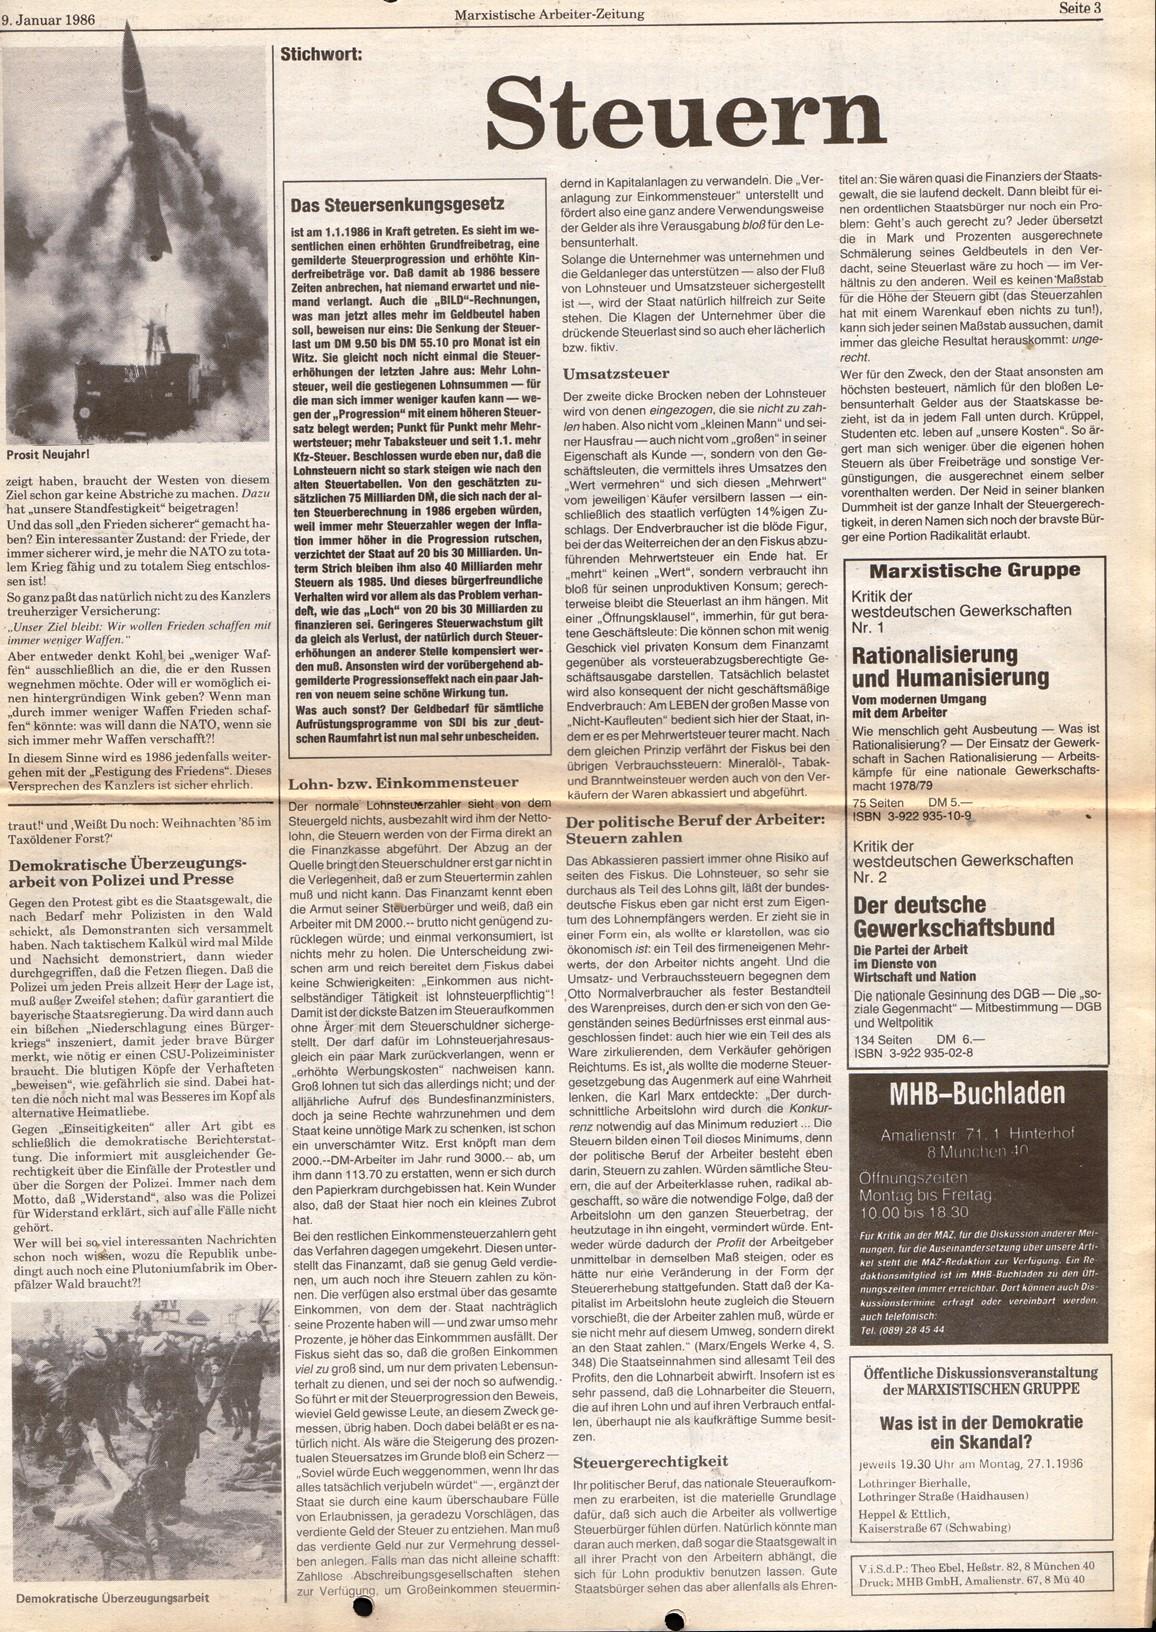 Muenchen_MG_MAZ_Kaufhaus_19860109_03